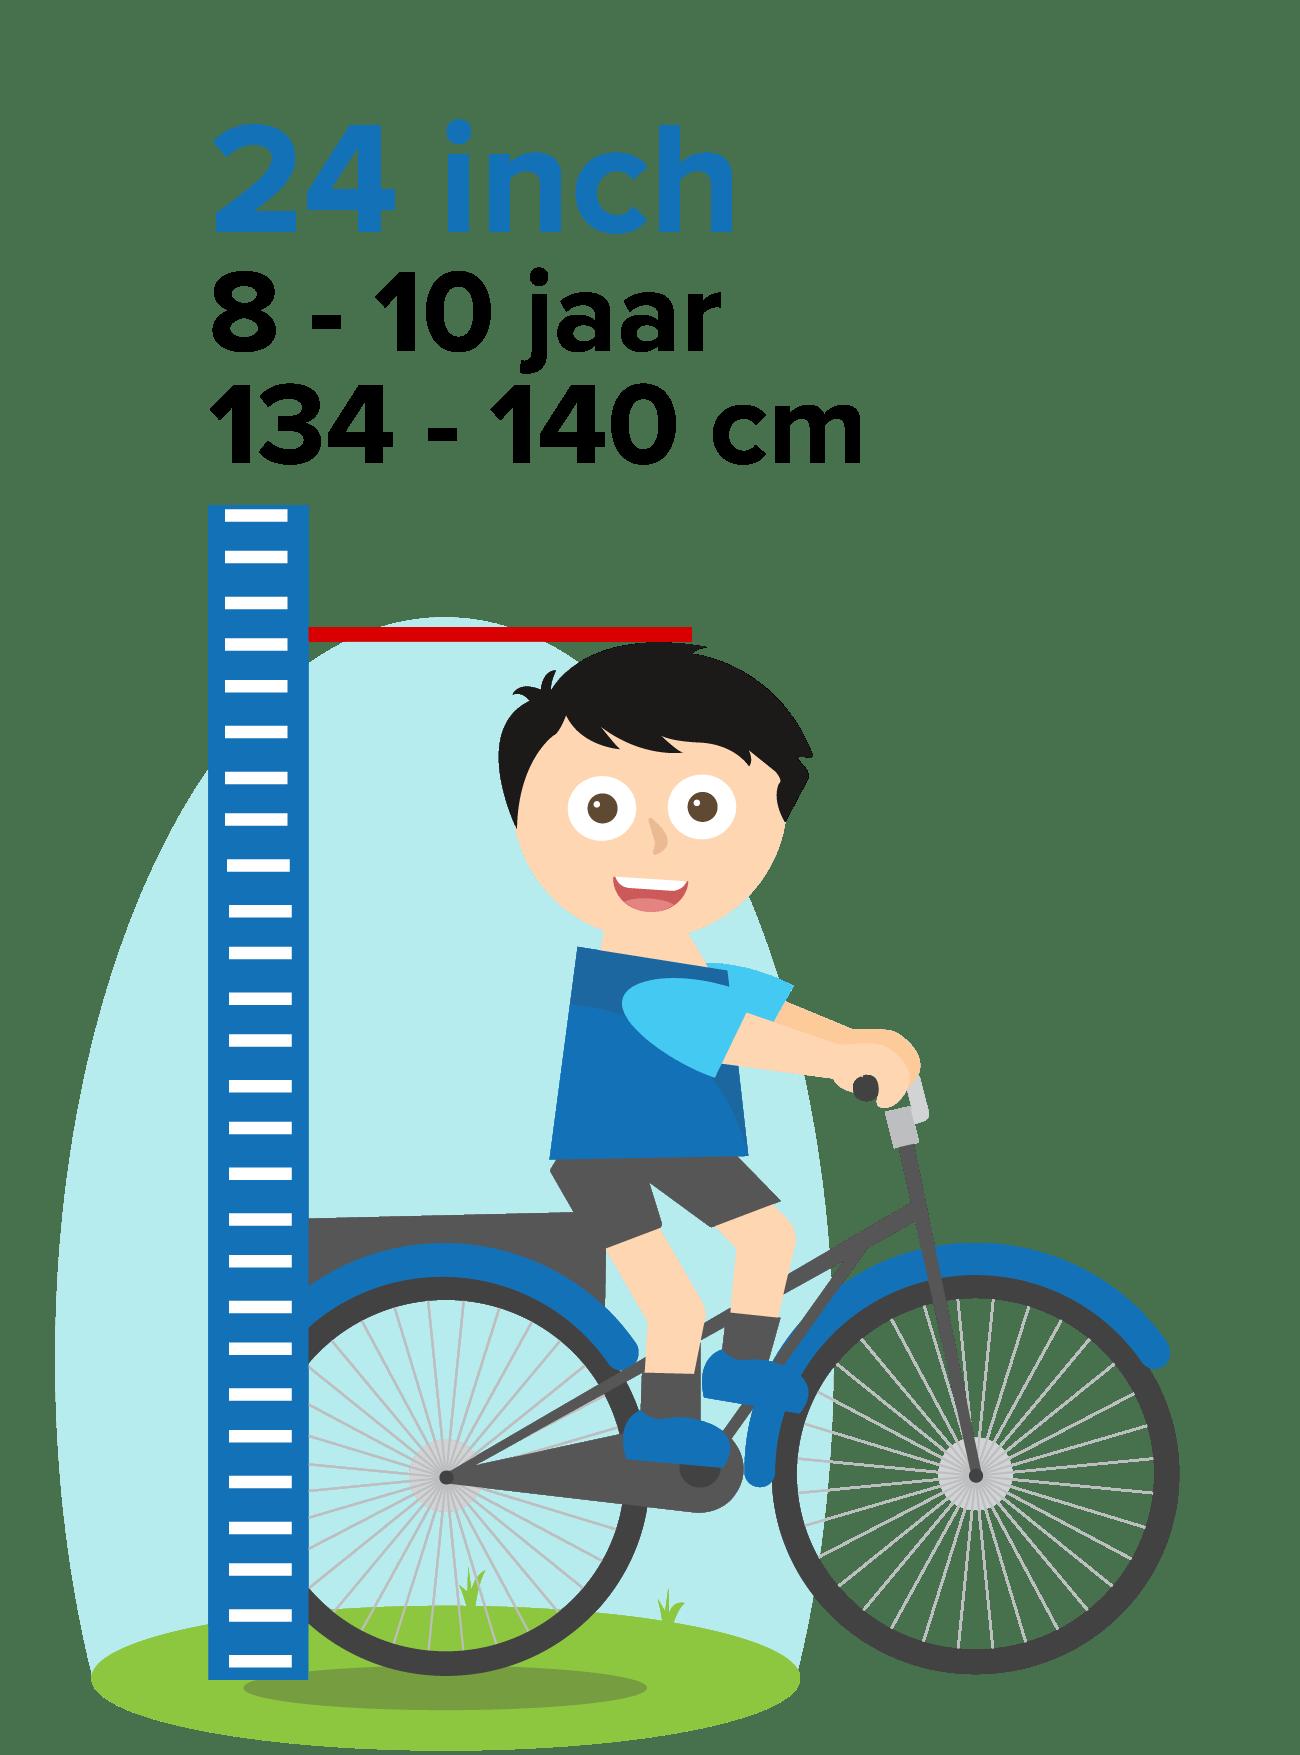 kinderfiets 24 inch